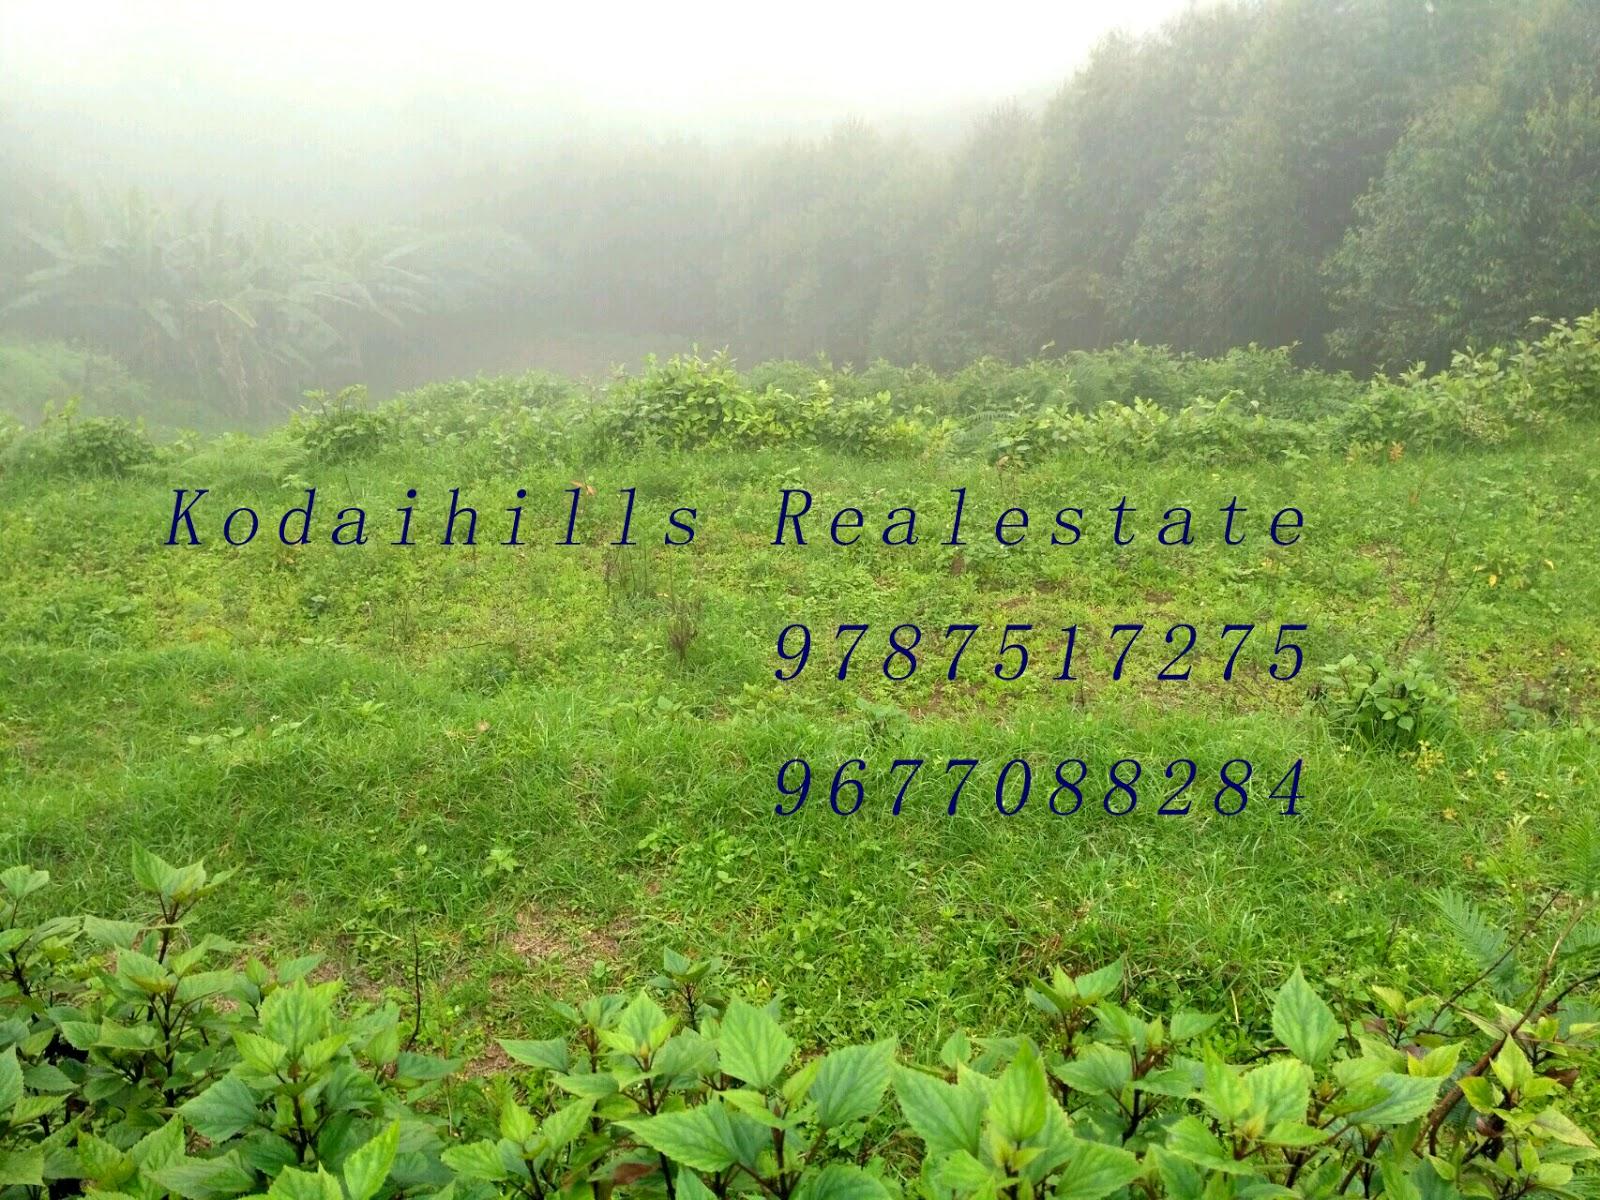 5 Acre agriculture land for sale in kodaikanal mountain range